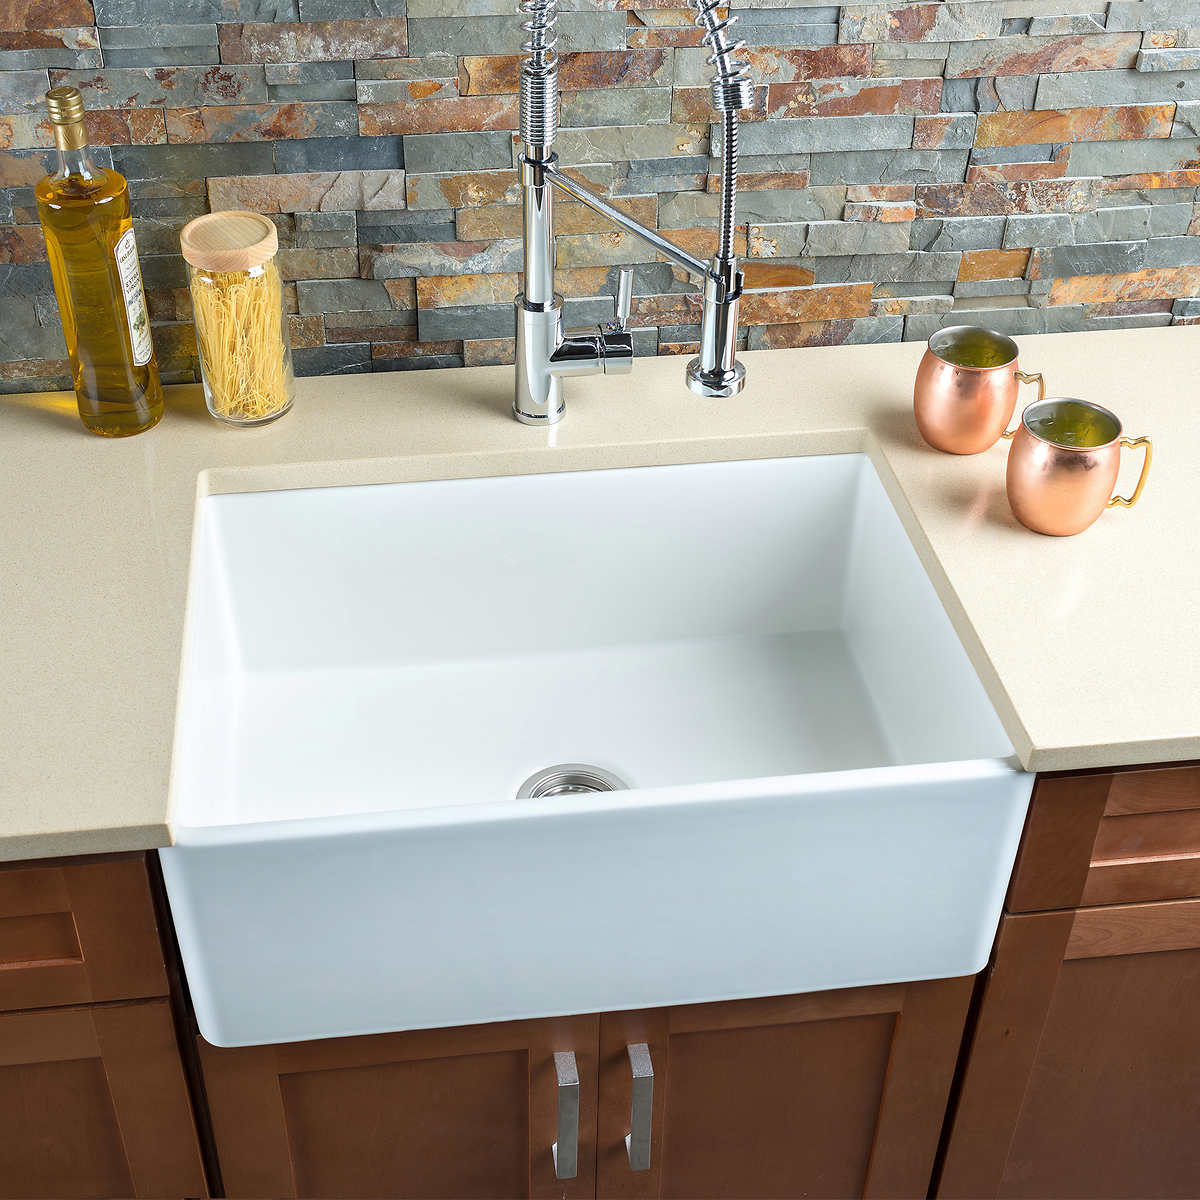 Blue apron costco - Hahn Fireclay Series Medium Single Farmhouse Kitchen Sink